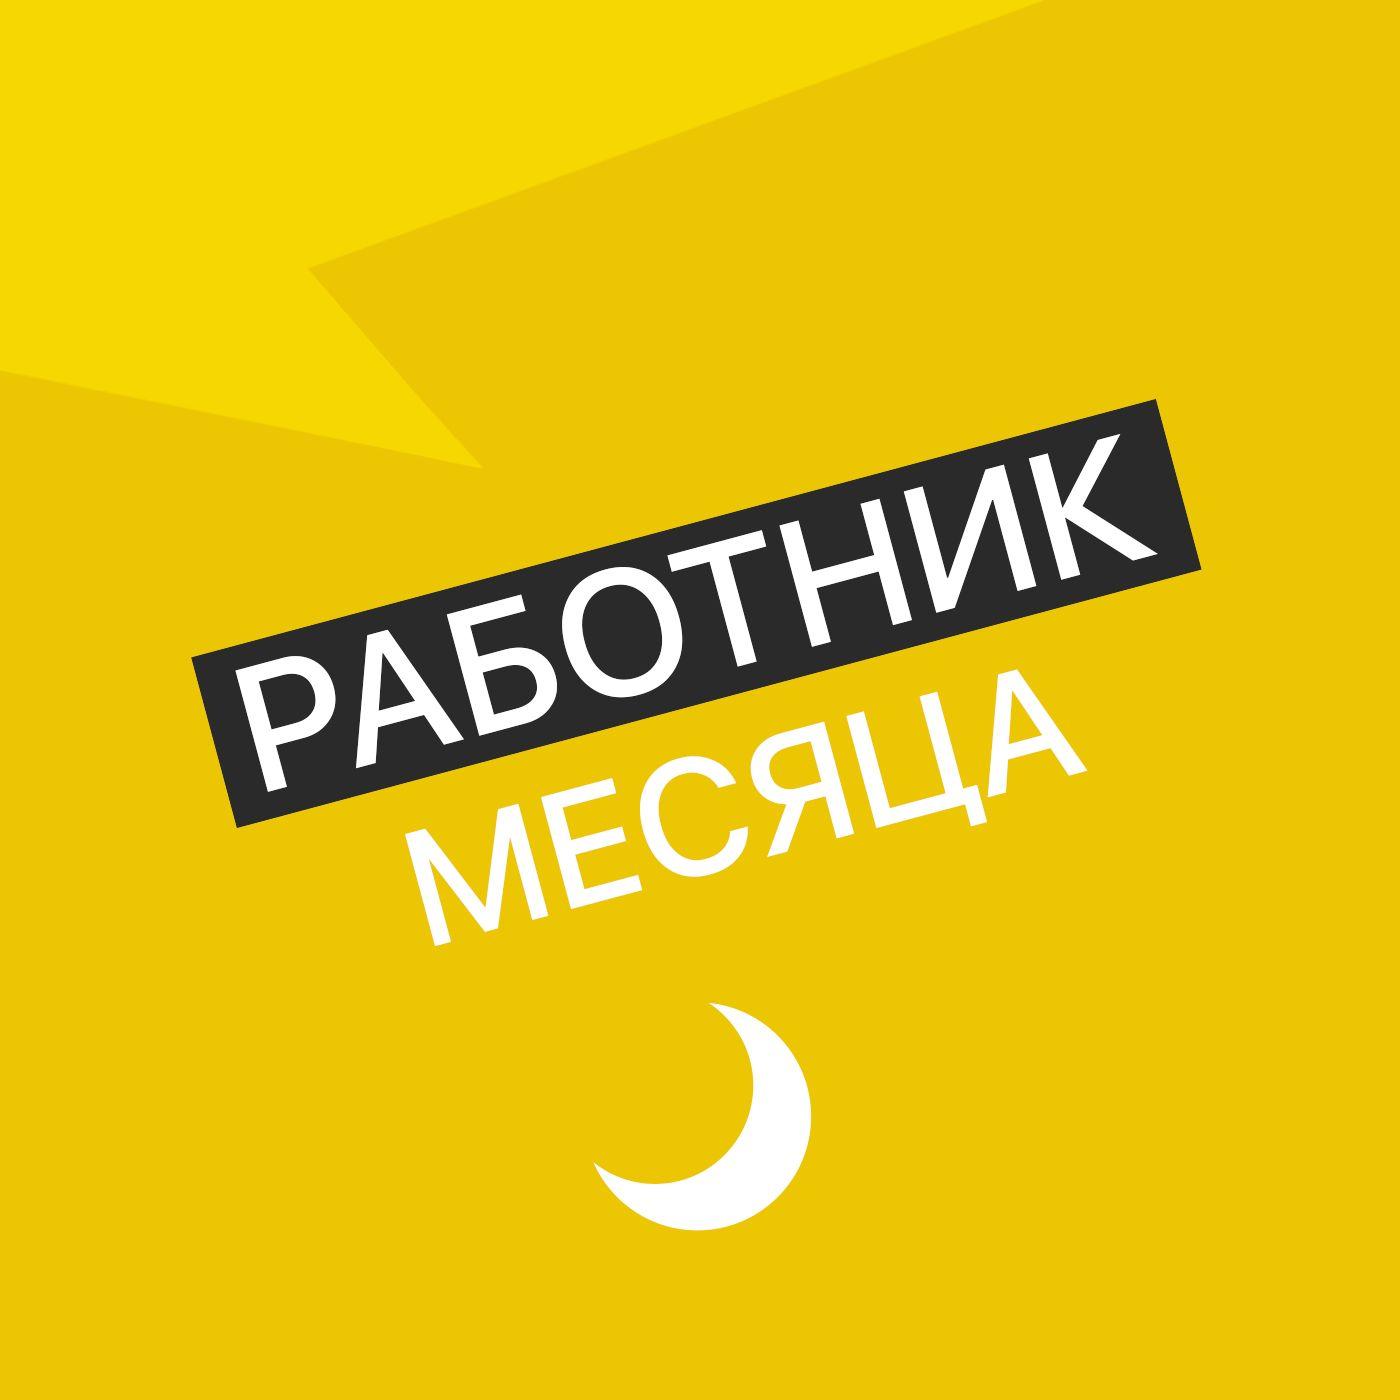 Творческий коллектив Mojomedia Владелец редакции творческий коллектив mojomedia владелец квесткомнаты